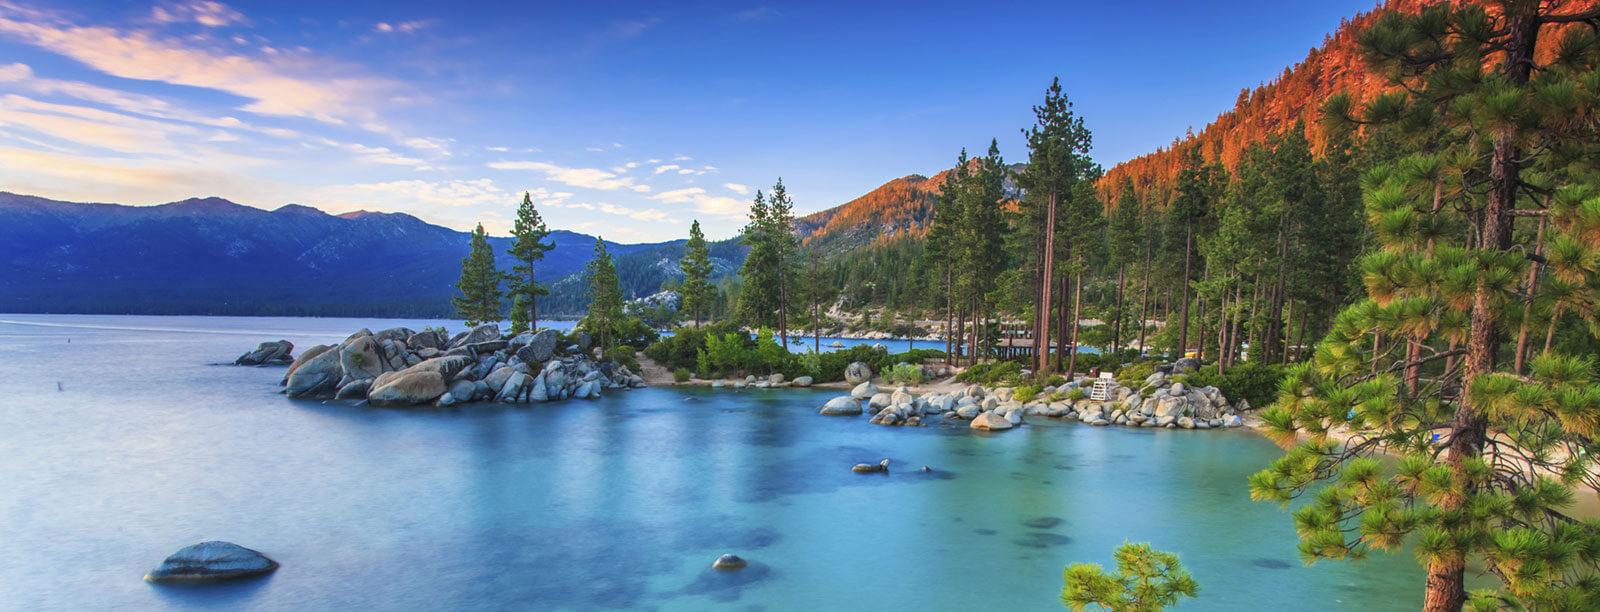 Go Explore South Lake Tahoe Kamp Rite The World